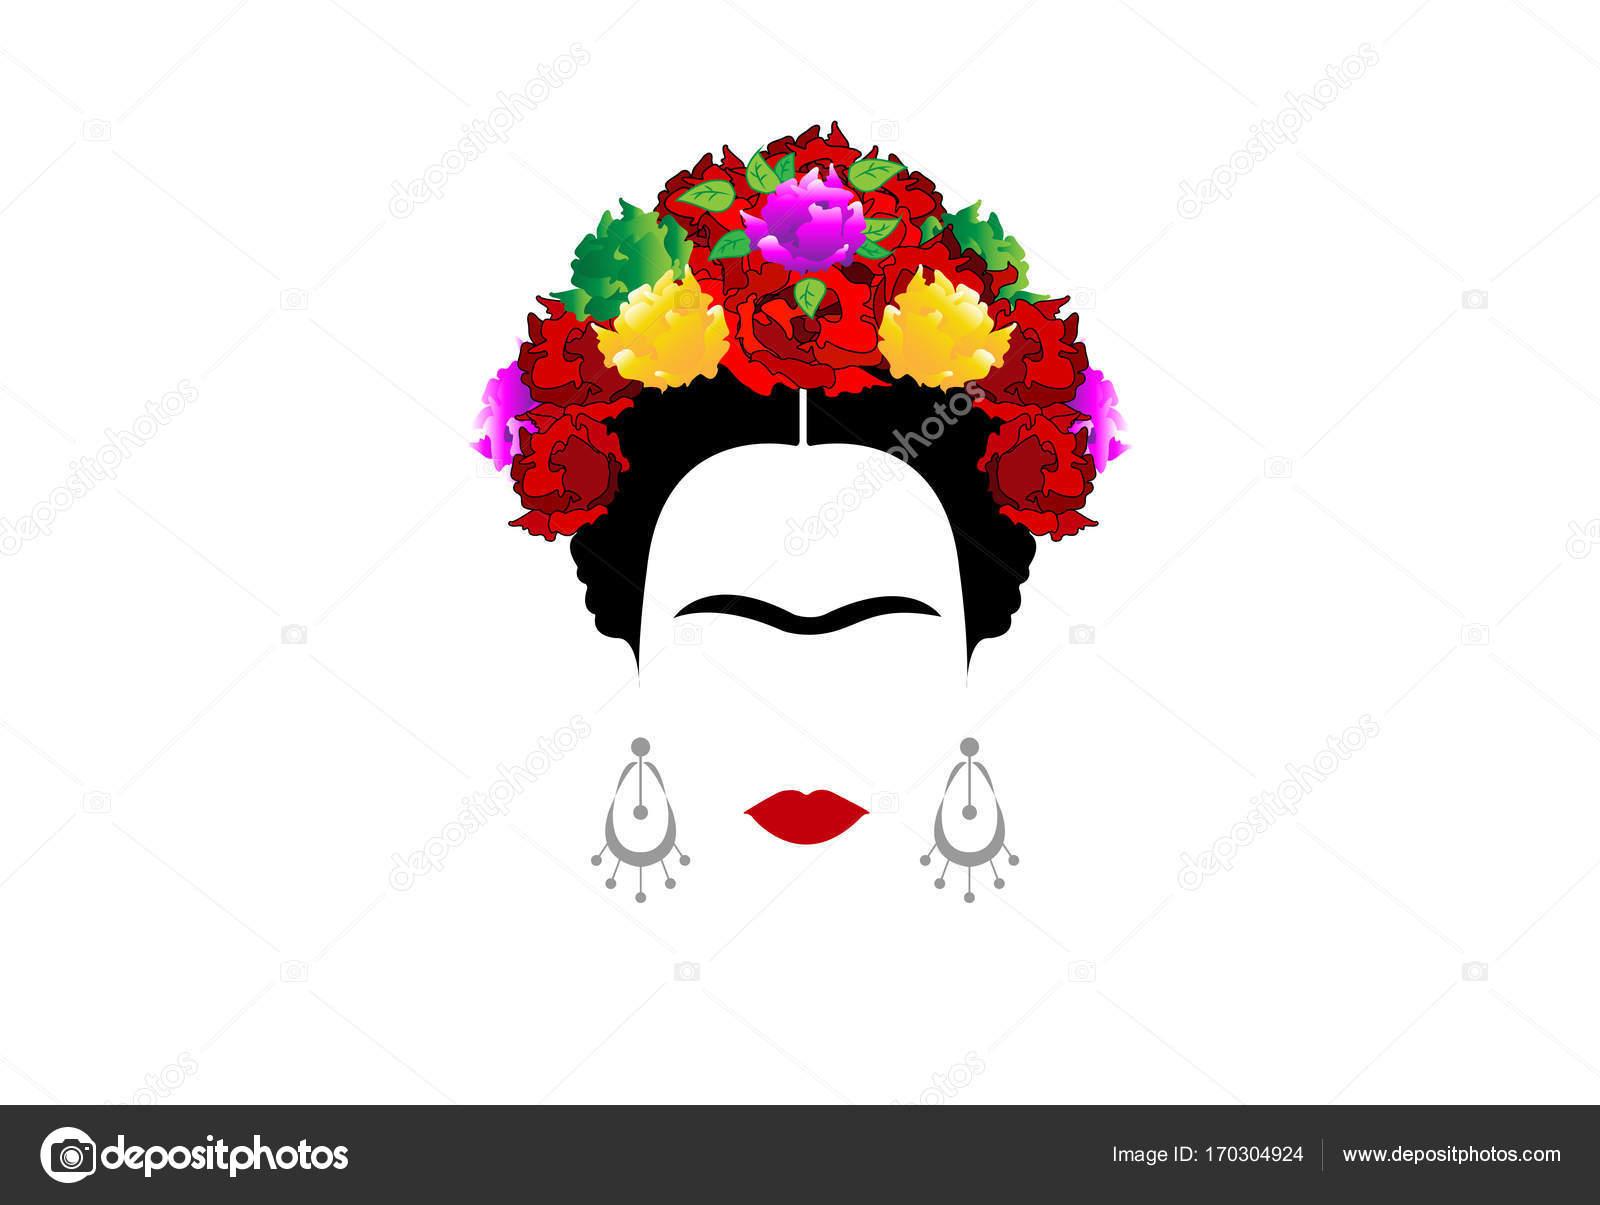 Dibujo Para Colorear De Frida Kahlo: Frida Kahlo, Retrato De Mujer Mexicana O Española Con